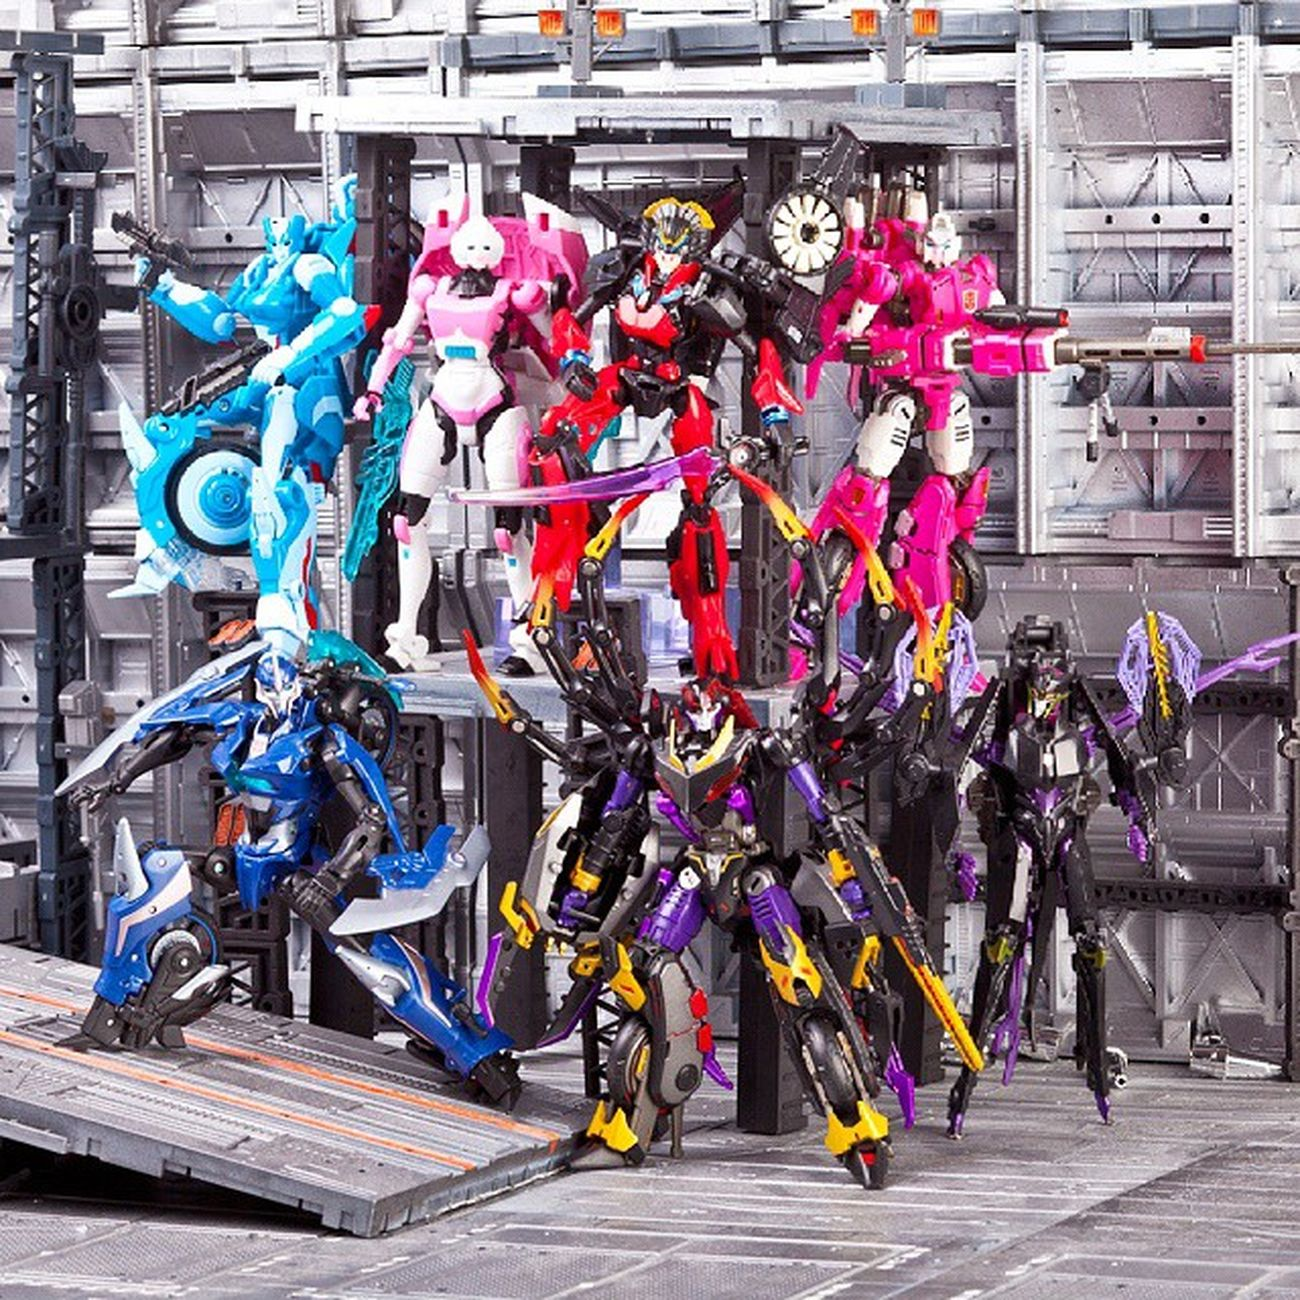 Women's team: Aranea & Arcee PerfectEffect, Airachnid & Arcee Prime, Chromia, Arcee & Windblade Women Womensteam Femobot Aranea Airachnid Arcee Chromia Windblade